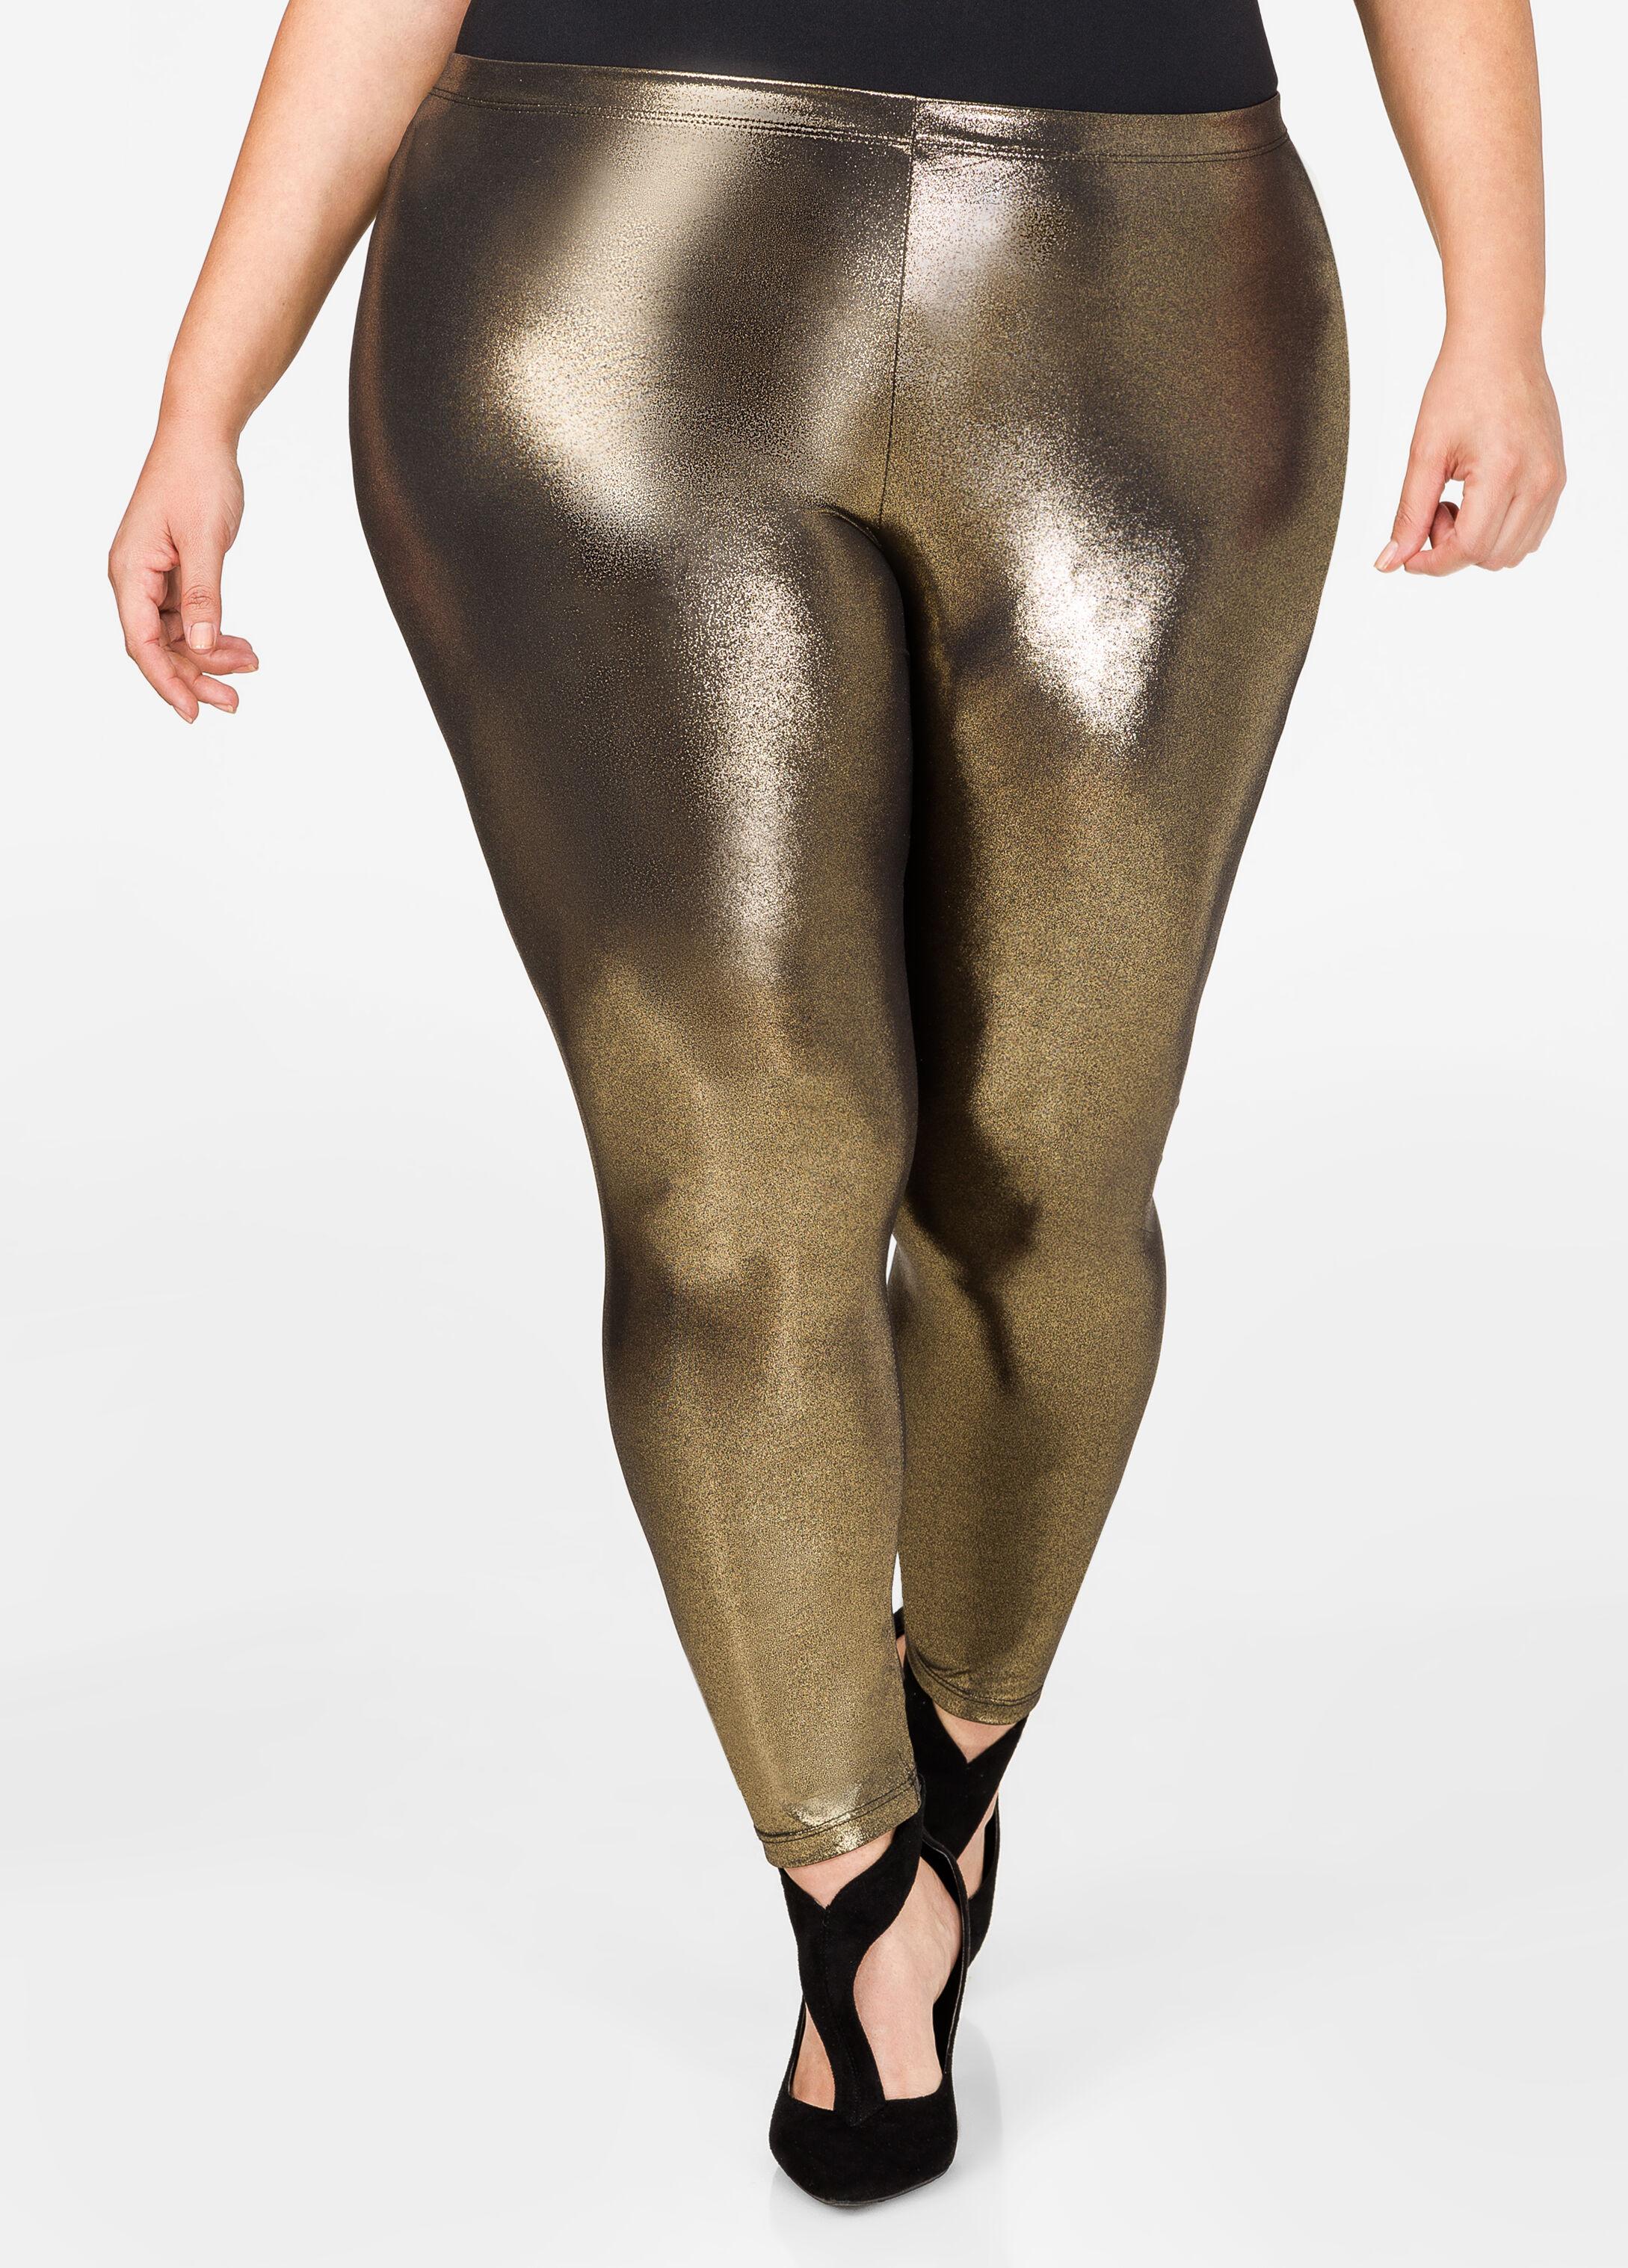 Watch Teens in spandex, wetlook, metallic leggings - 24 Pics at downloadsolutionspa5tr.gq! Hot little teens in wetlook, spandex, metallic leggings.